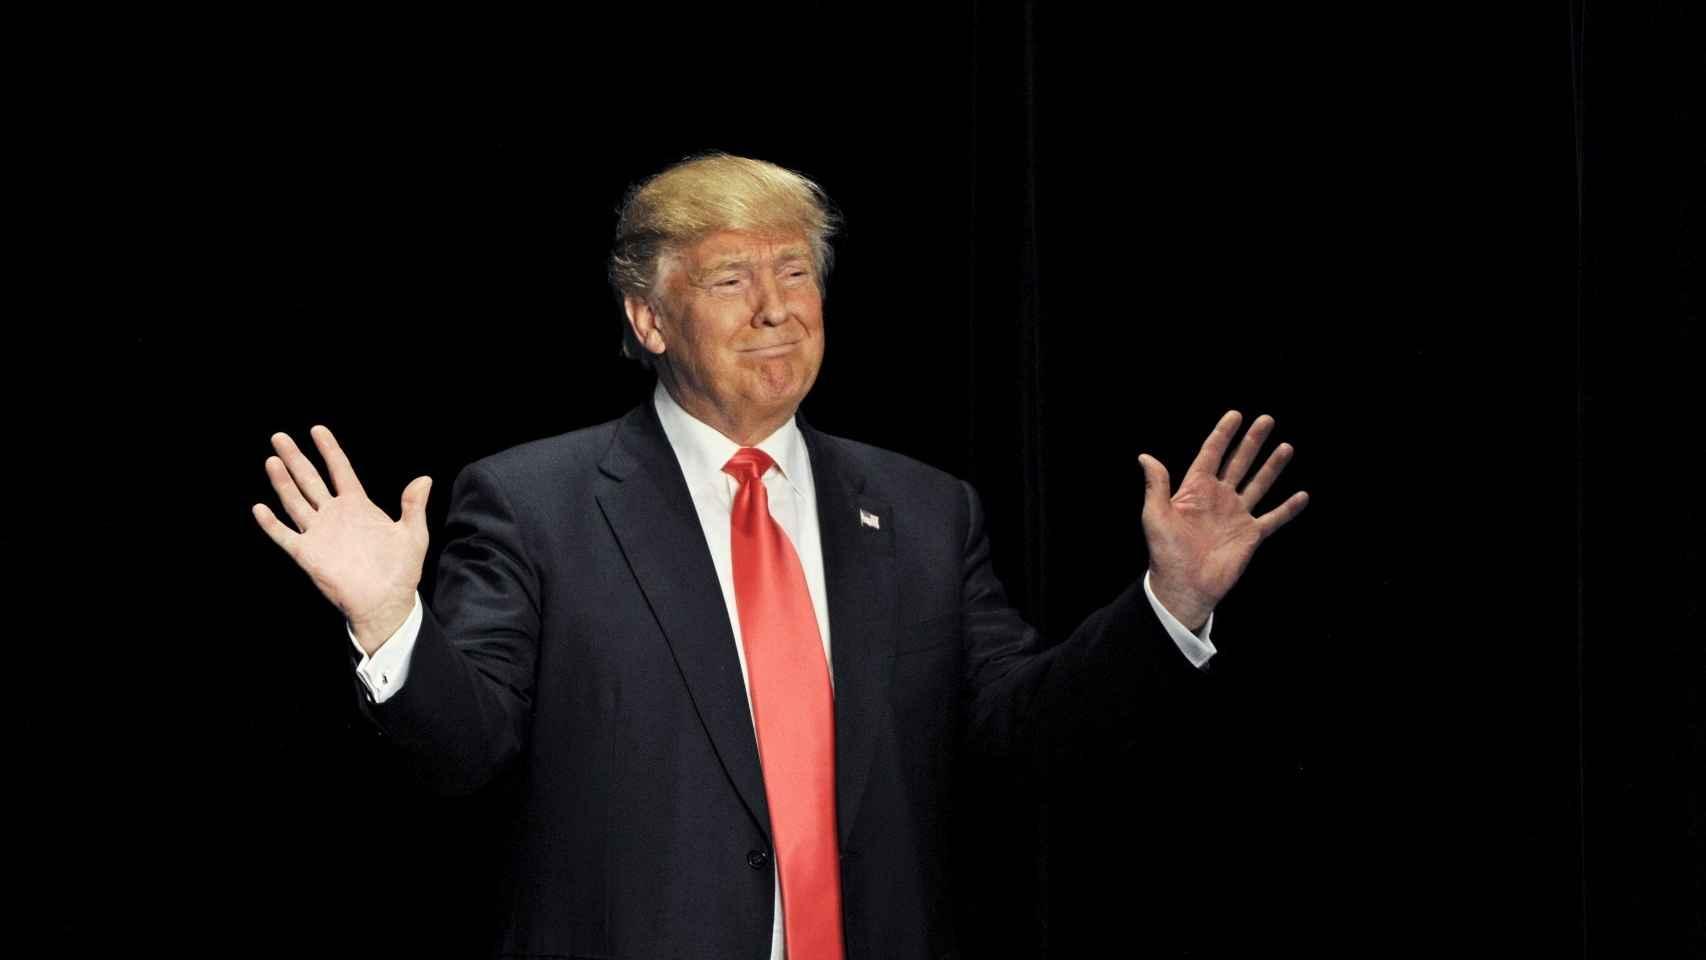 Donald Trump aclamado en Sioux Falls, Iowa.